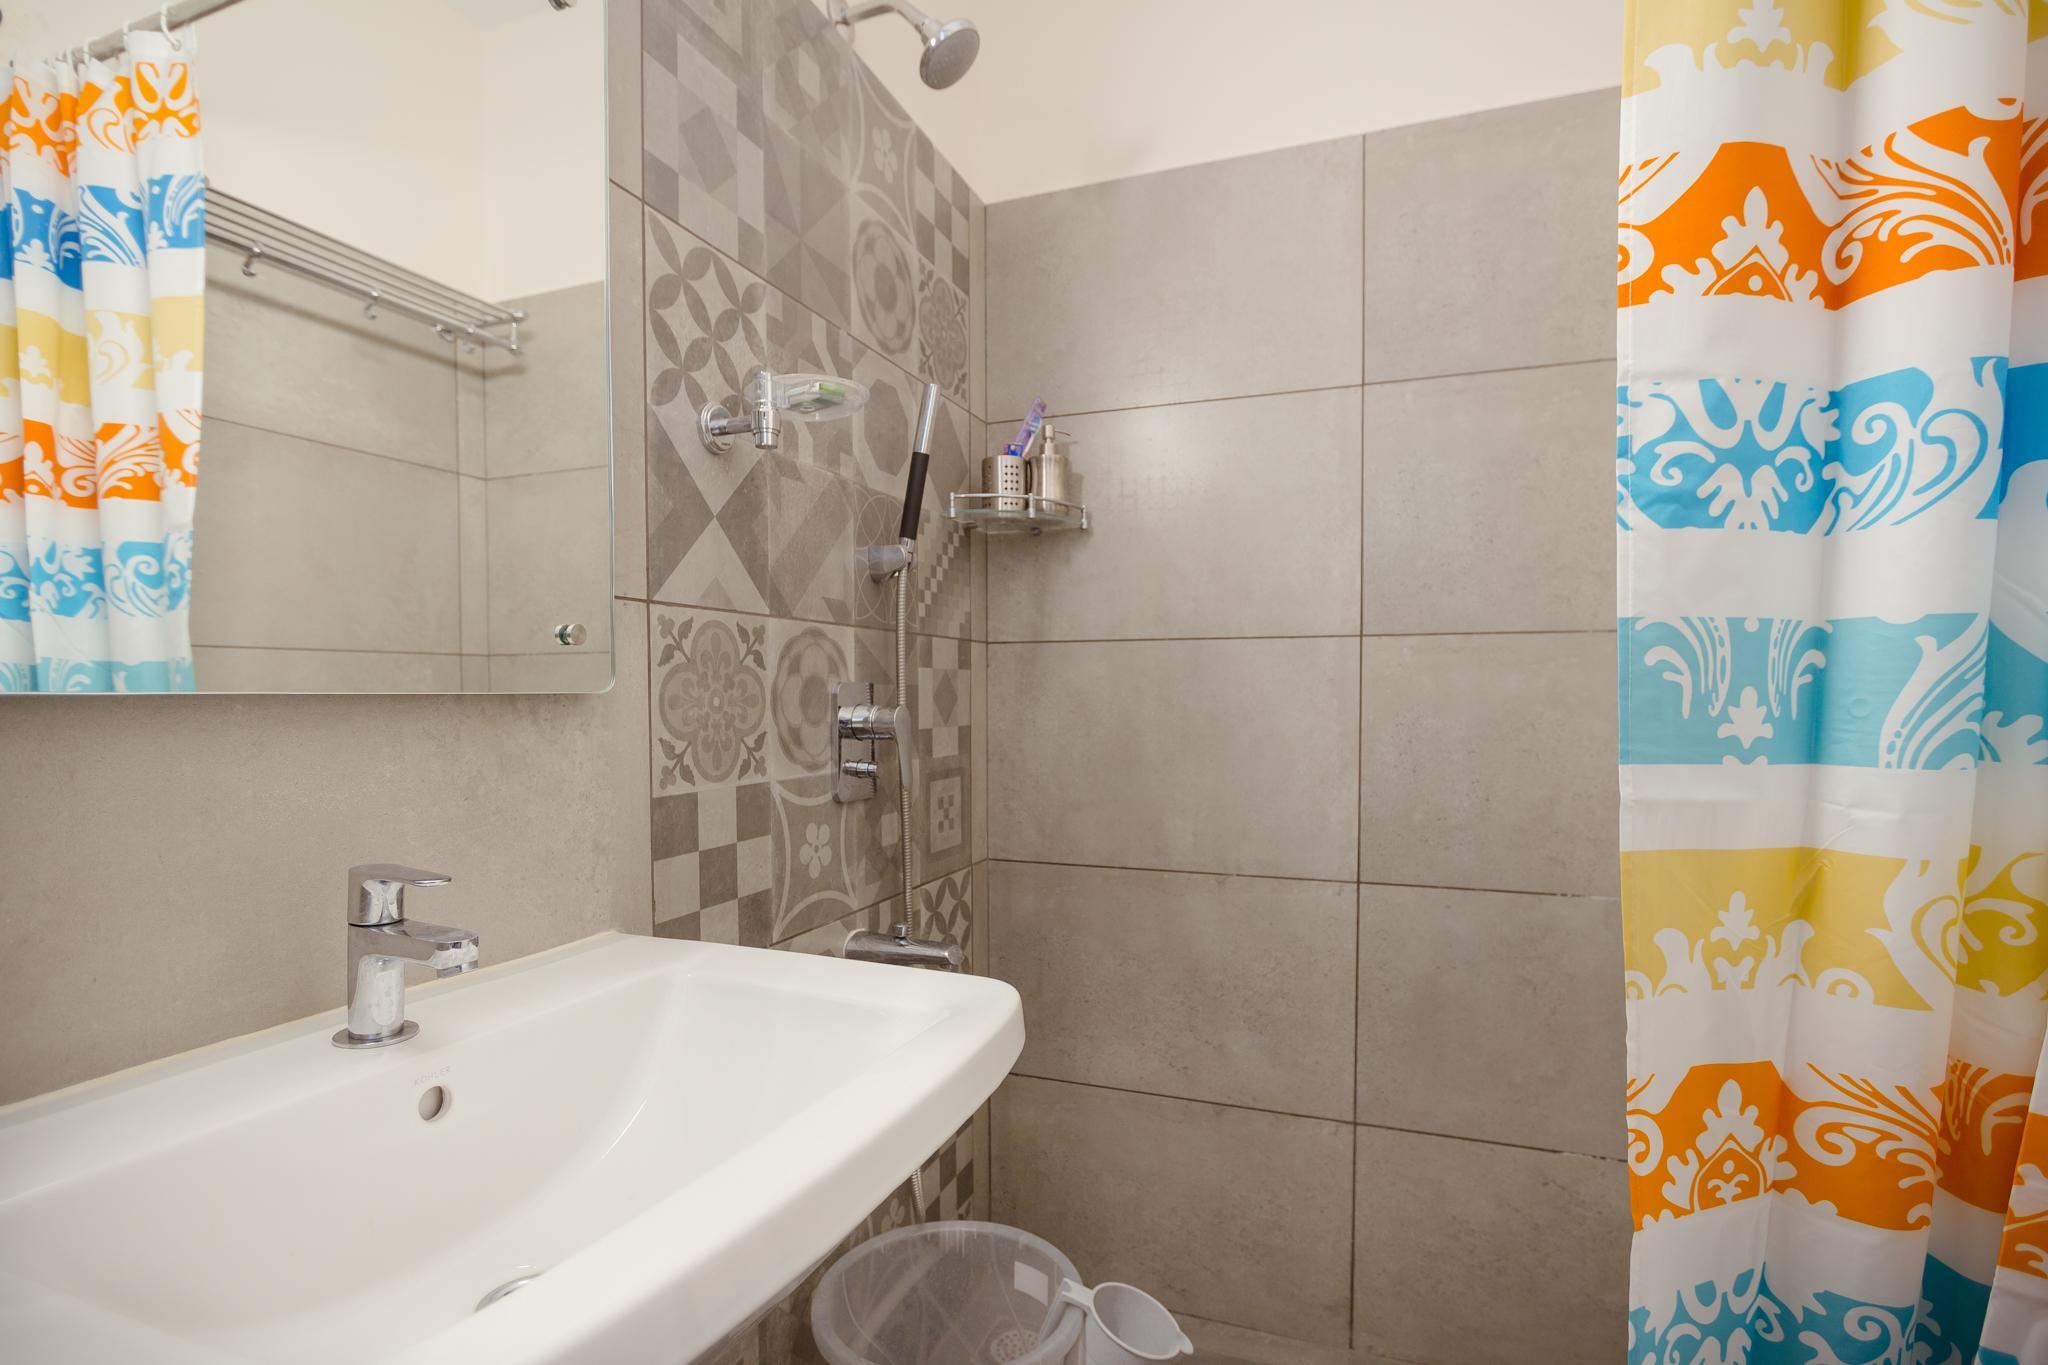 Kolam Serviced Apartments, Hotels in Chennai India - Near ...